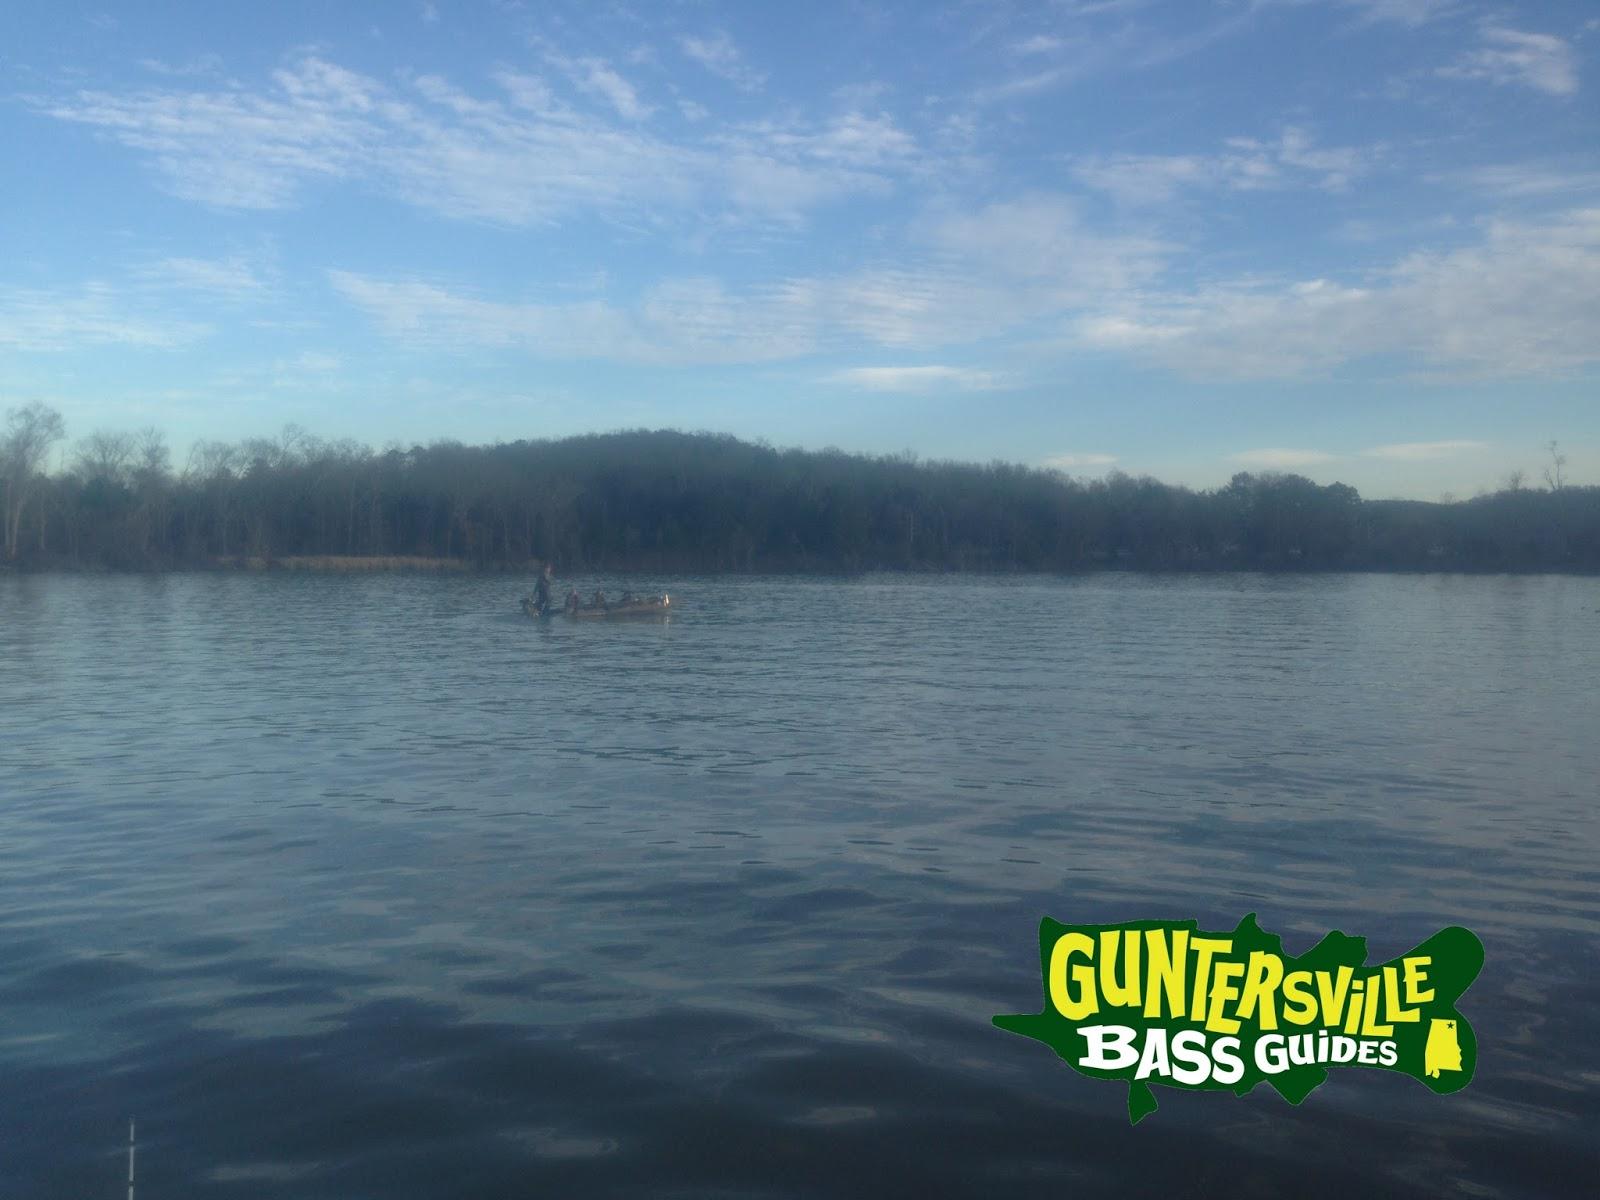 Lake guntersville fishing report guntersville bass guides for Lake guntersville fishing hot spots